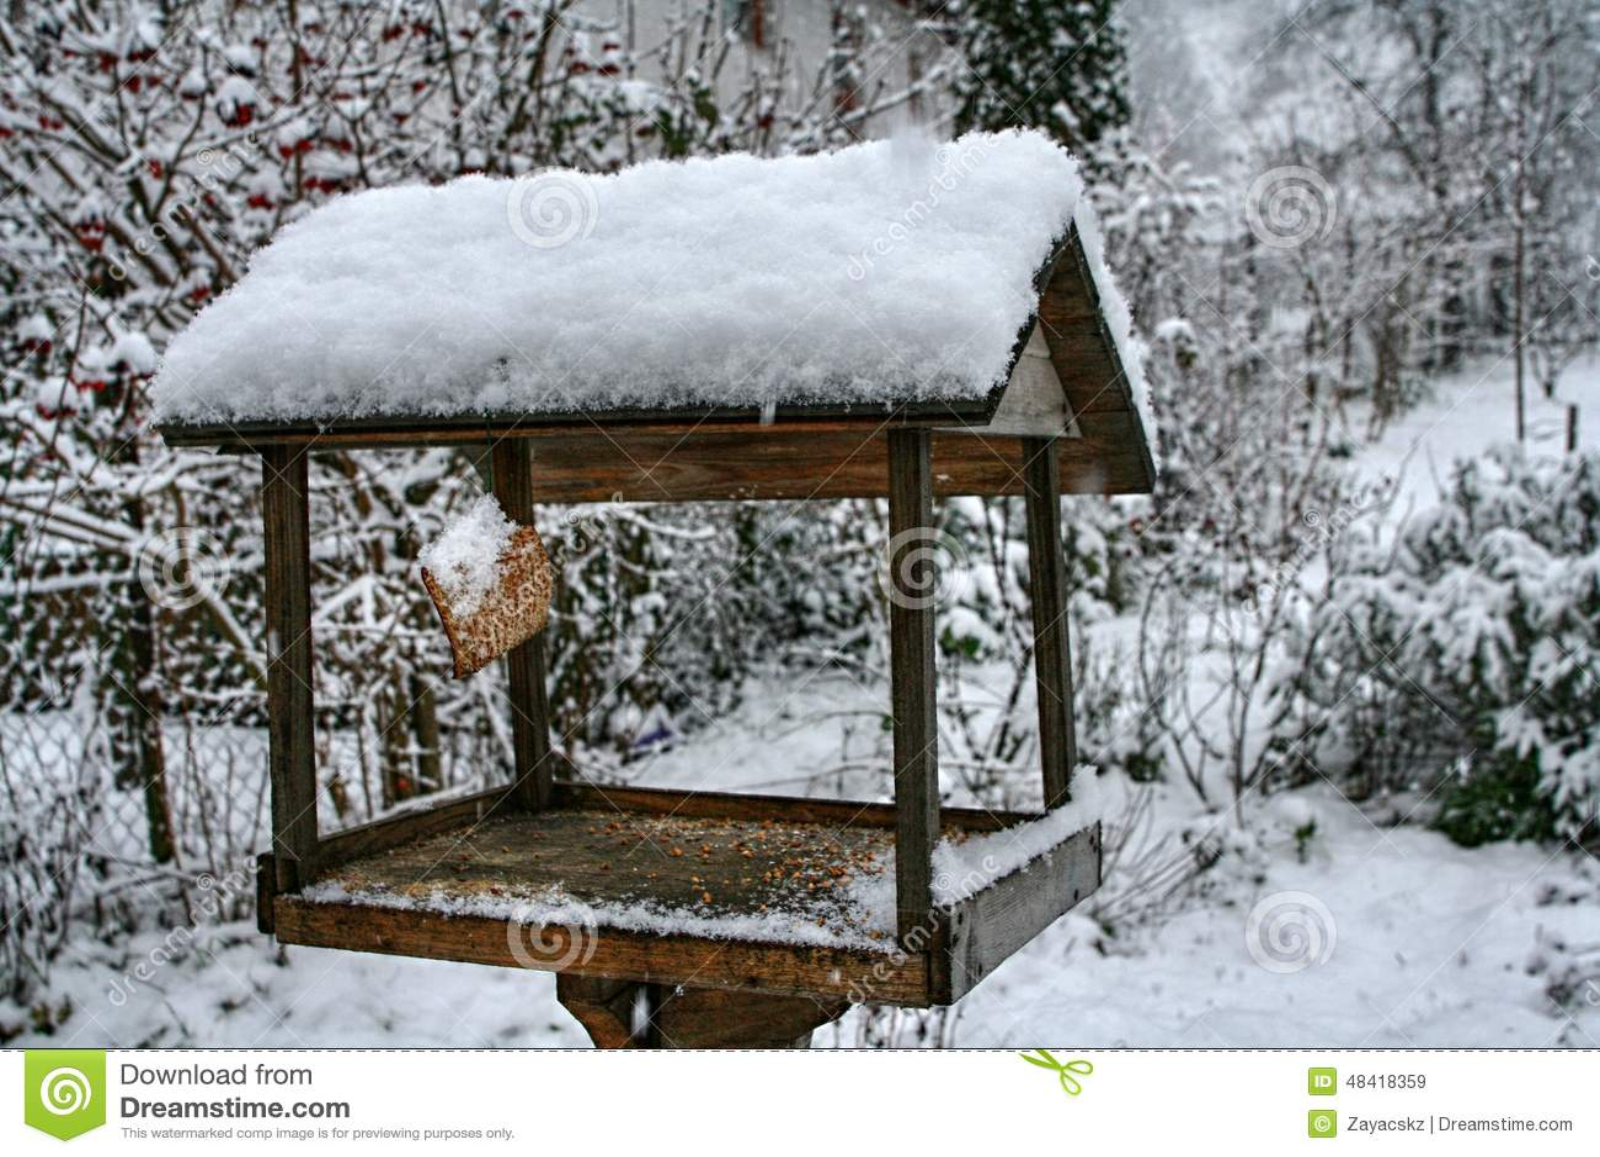 Wood Bird Shelter : Wood bird feeder plans wine bottle free diy